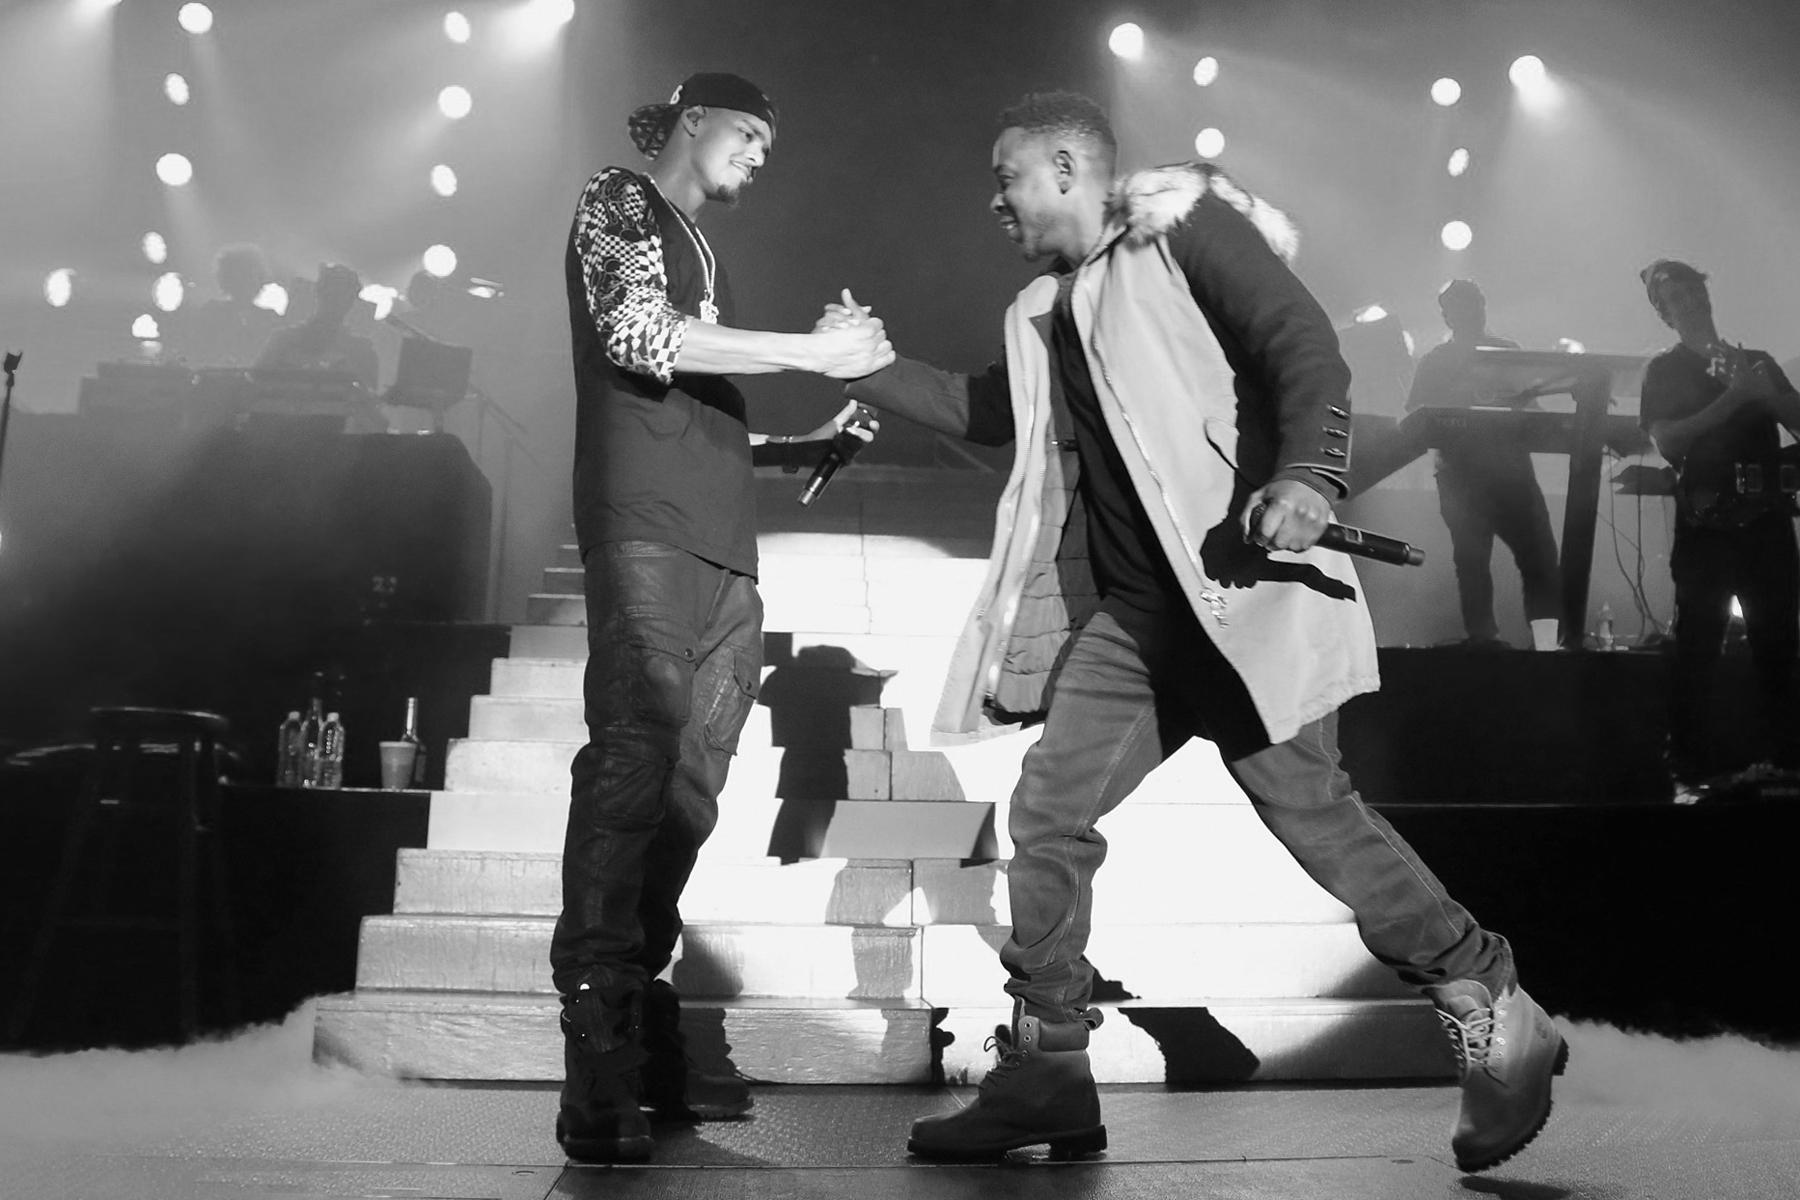 Kendrick Lamar and J. Cole Trade Verses on Black Friday